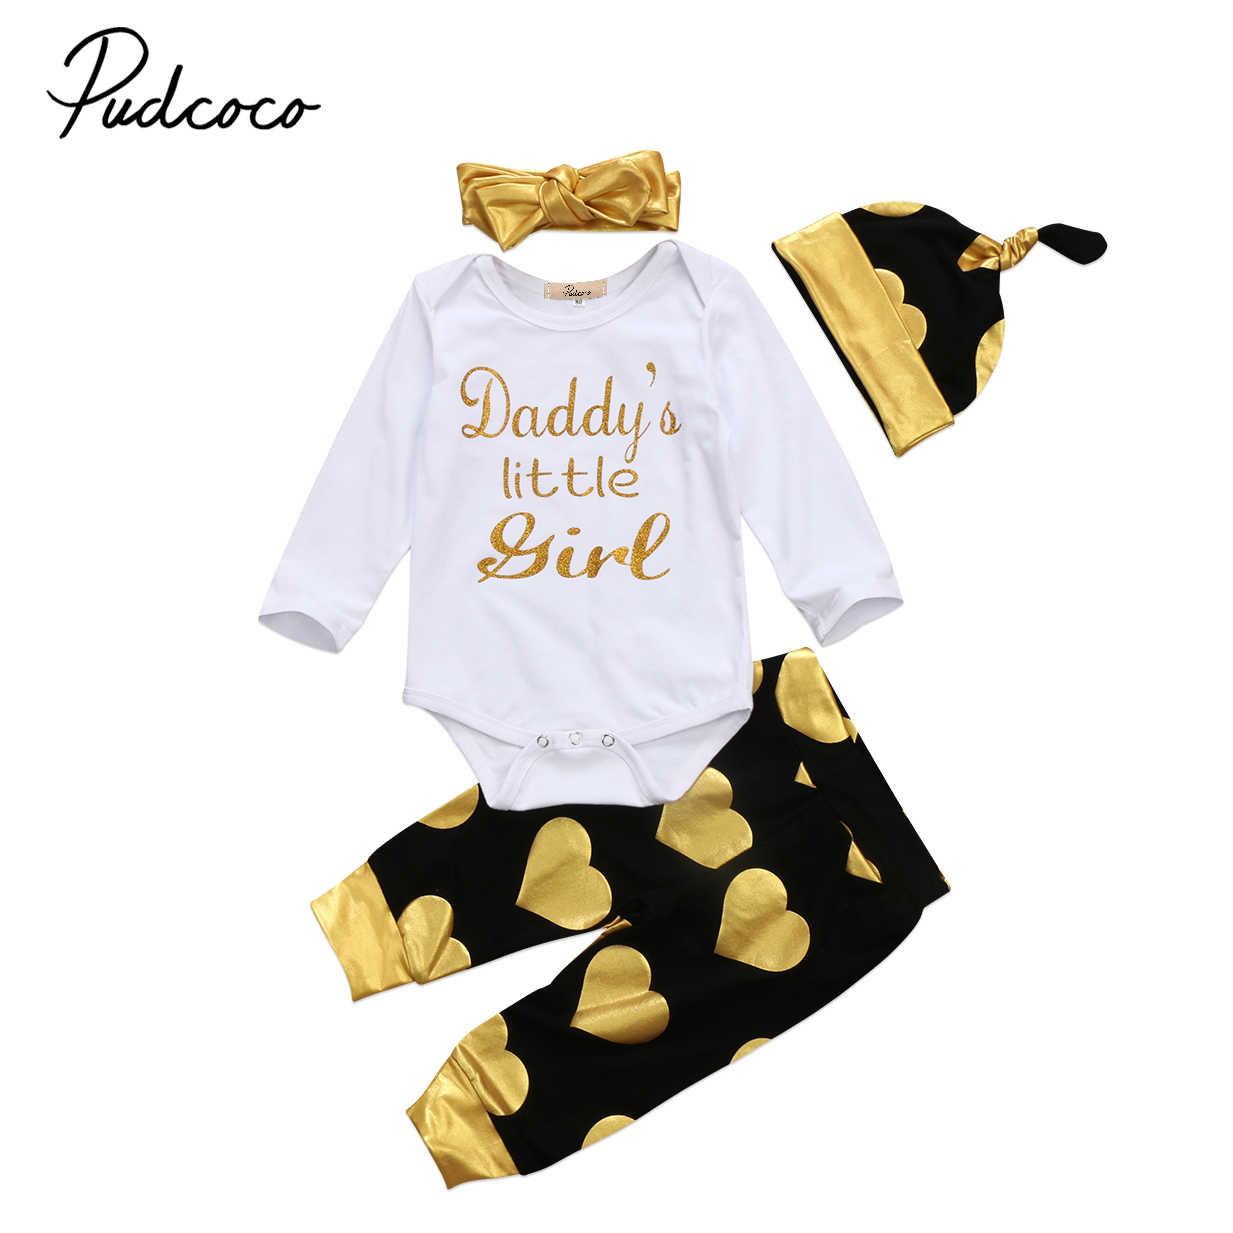 2d5a00ee852 4PCS Floral Set Newborn Baby Girls Daddys little girl Long Sleeve Tops  Romper +Long Pants